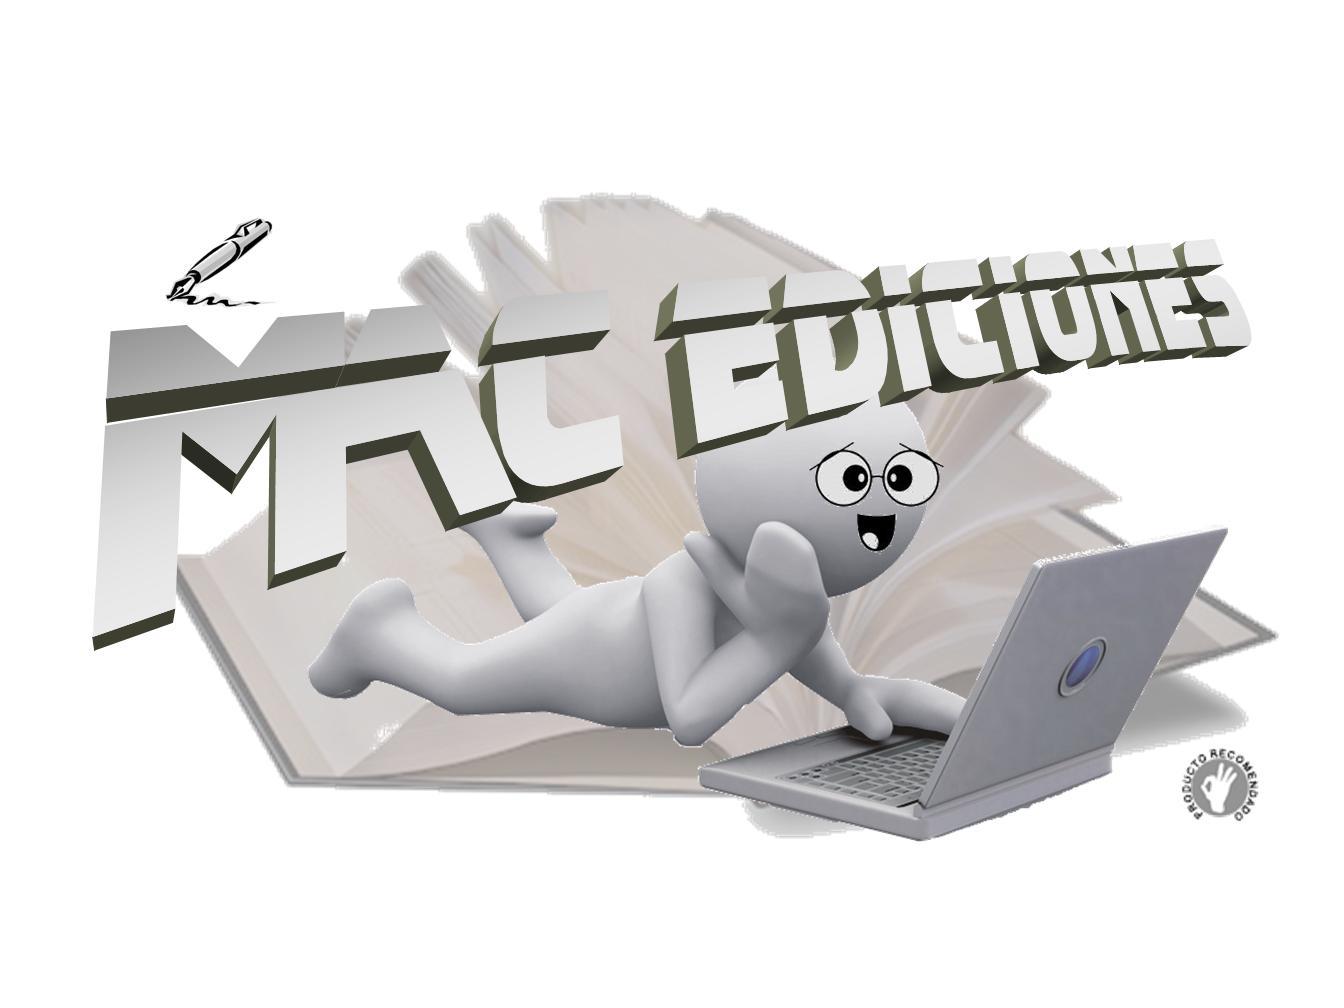 MAC Ediciones.